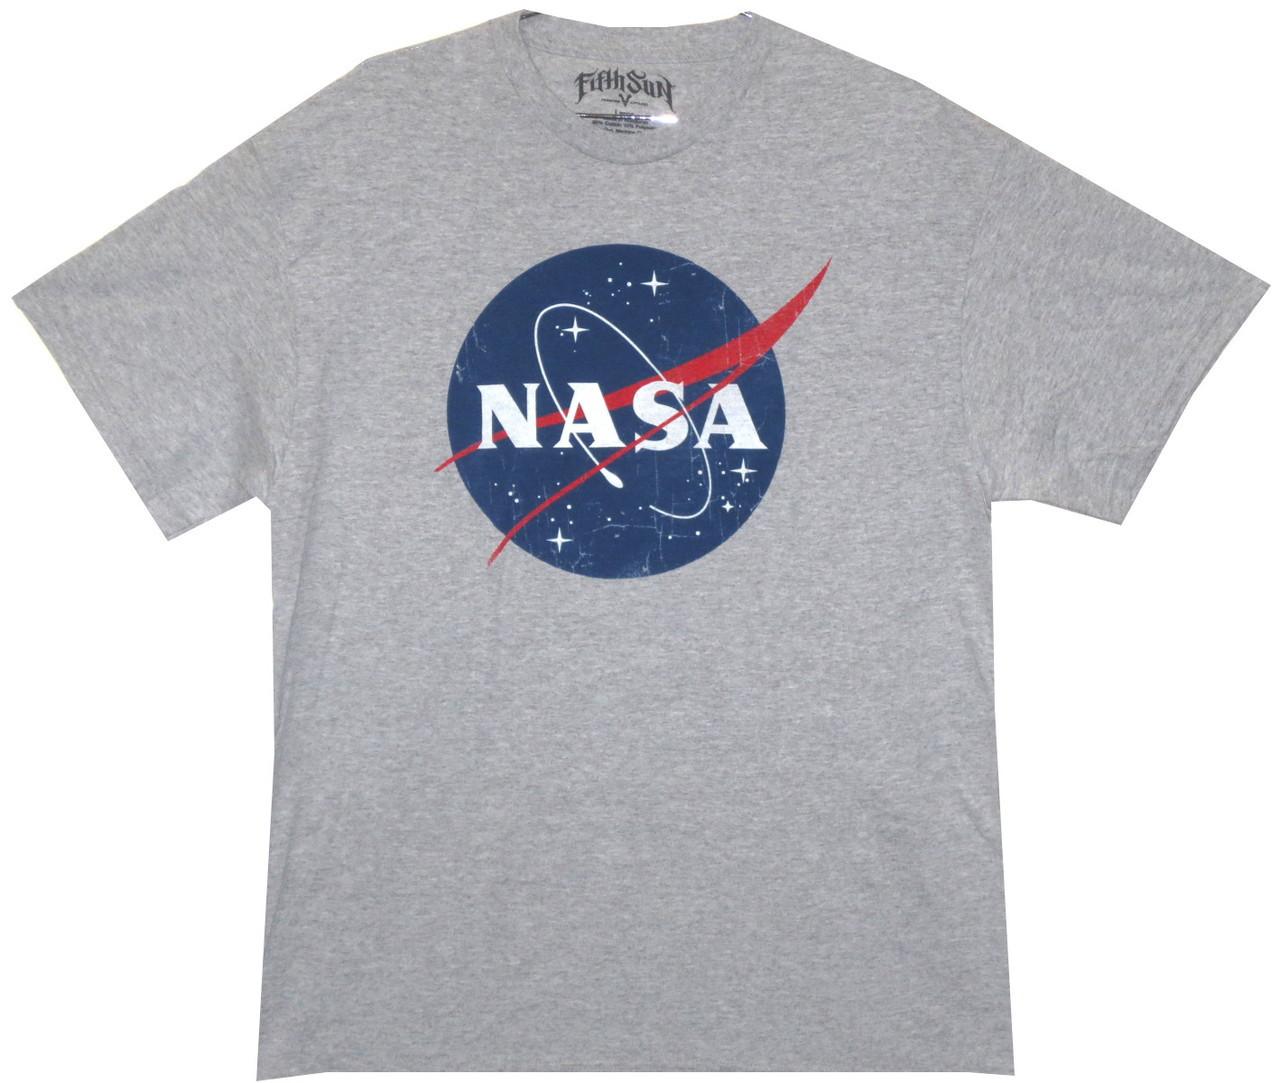 a4aefe8aecbf Distressed NASA Logo T-Shirt - NerdKungFu